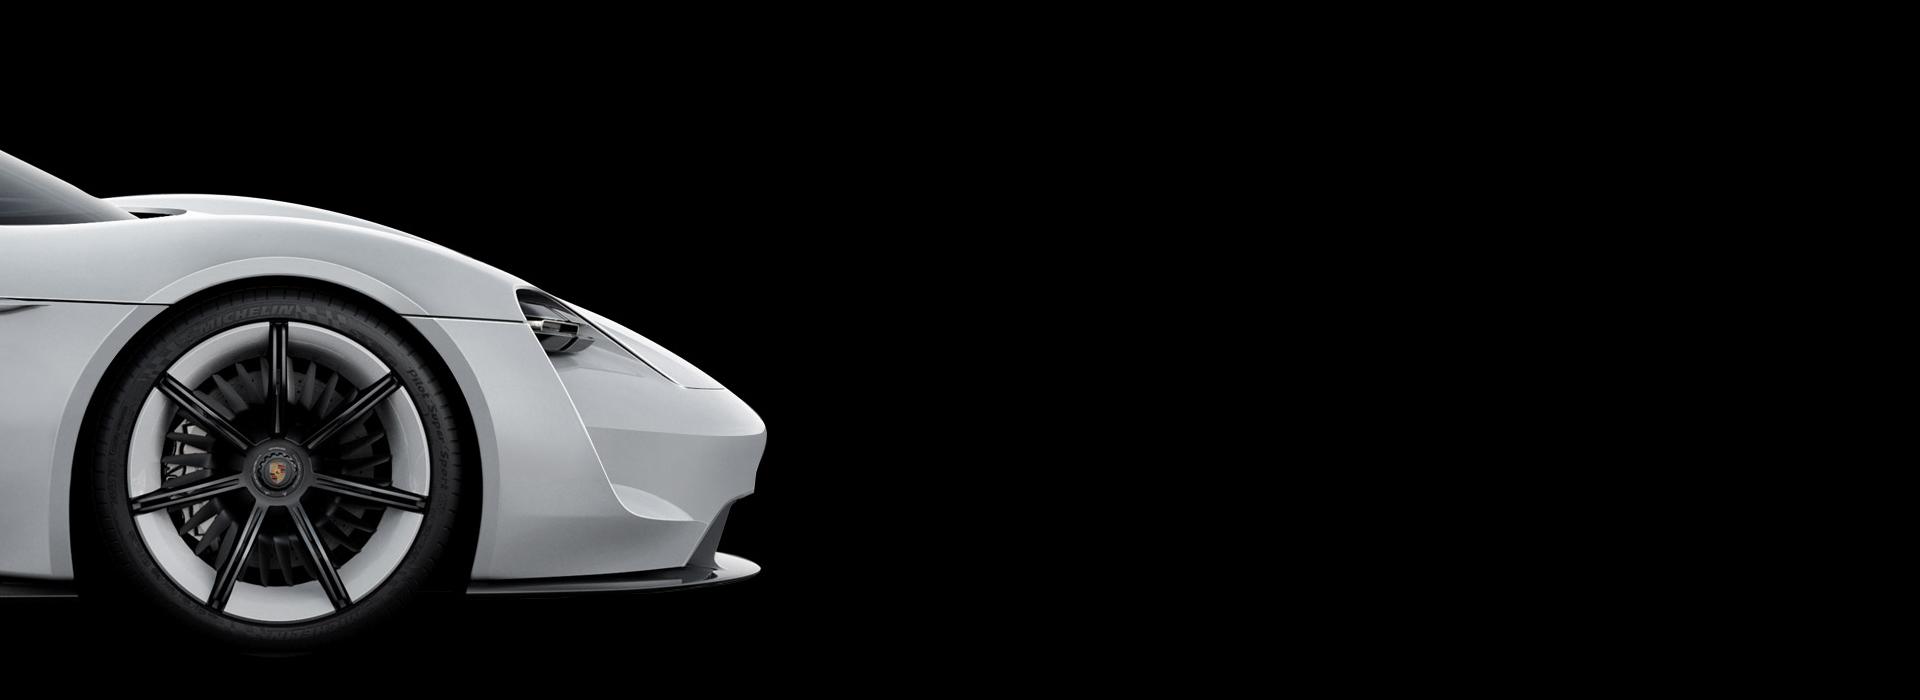 Porsche Mission E concept - wheel / jante